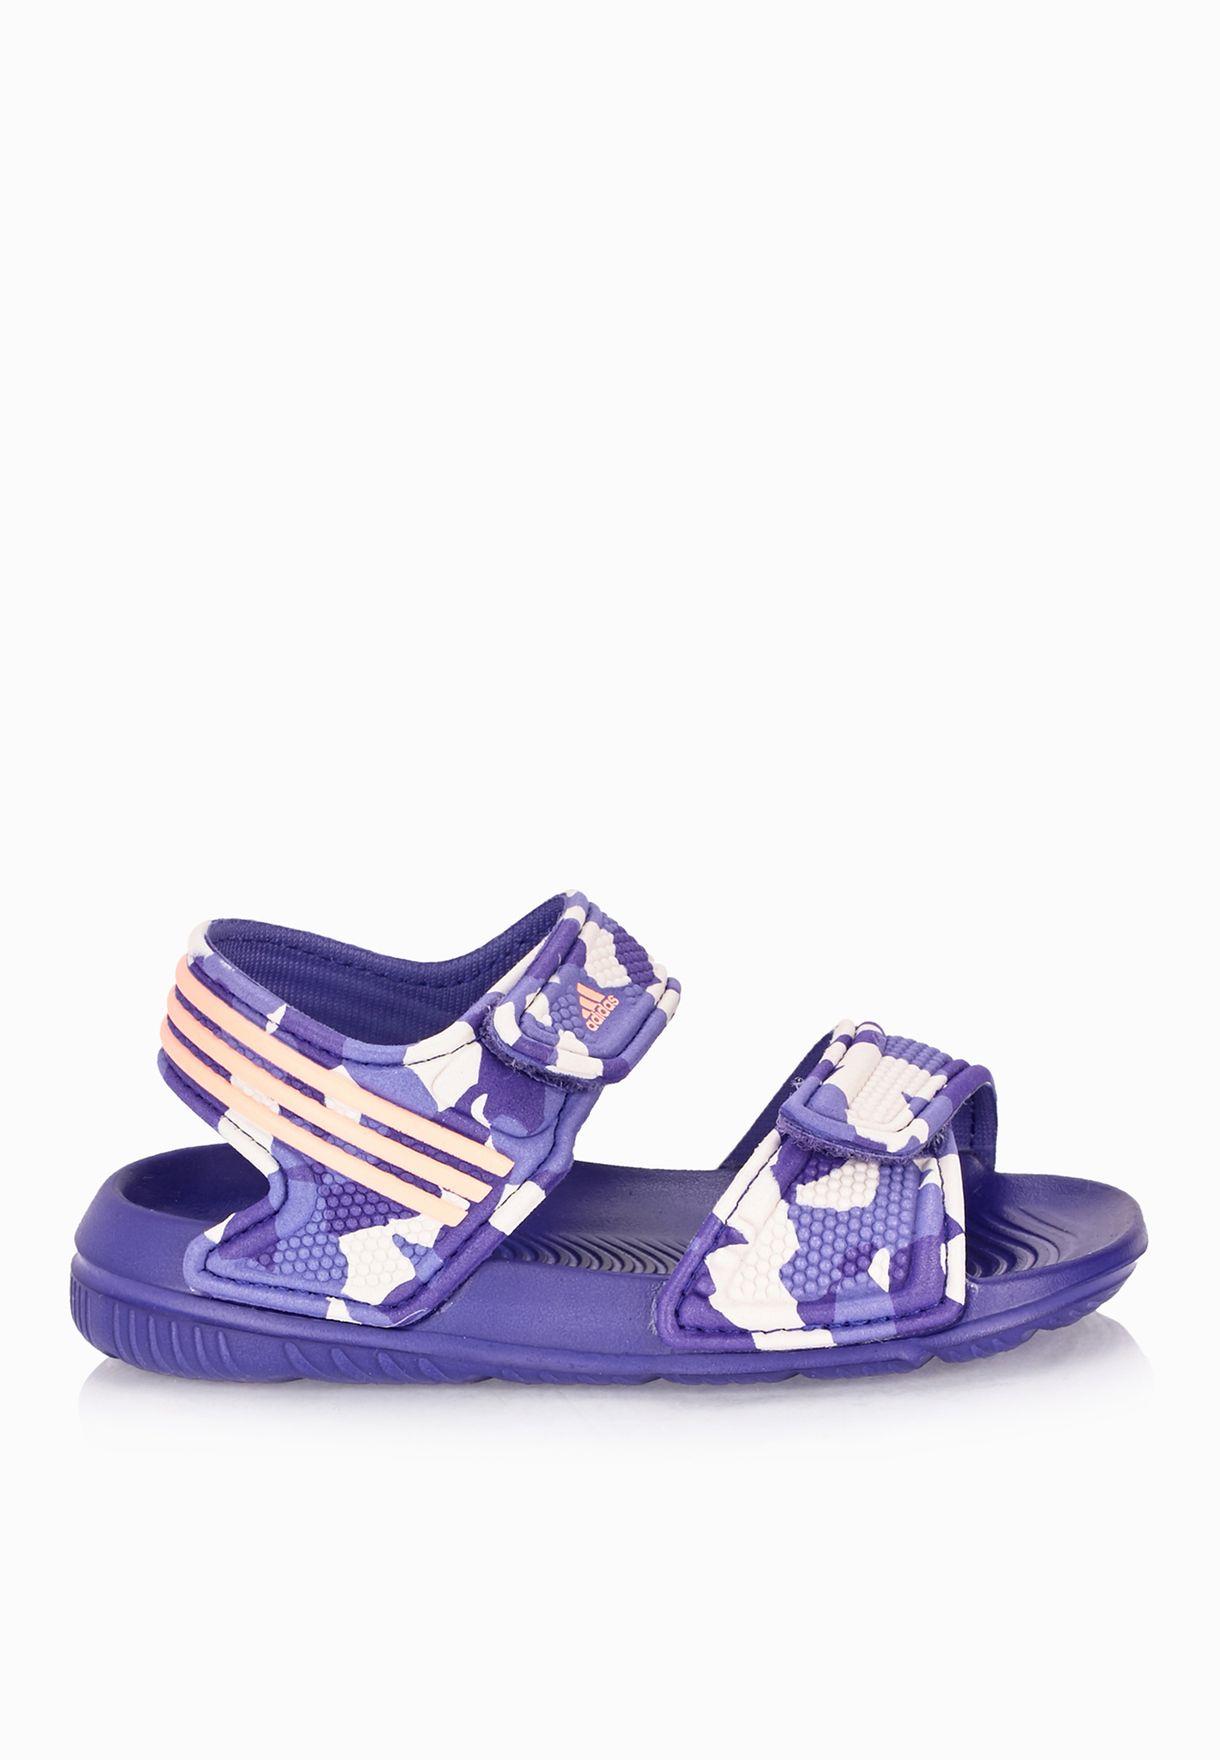 5c342ce41c79c Shop adidas purple Akwah 9 Infant S80524 for Kids in UAE - AD476SH64PMX